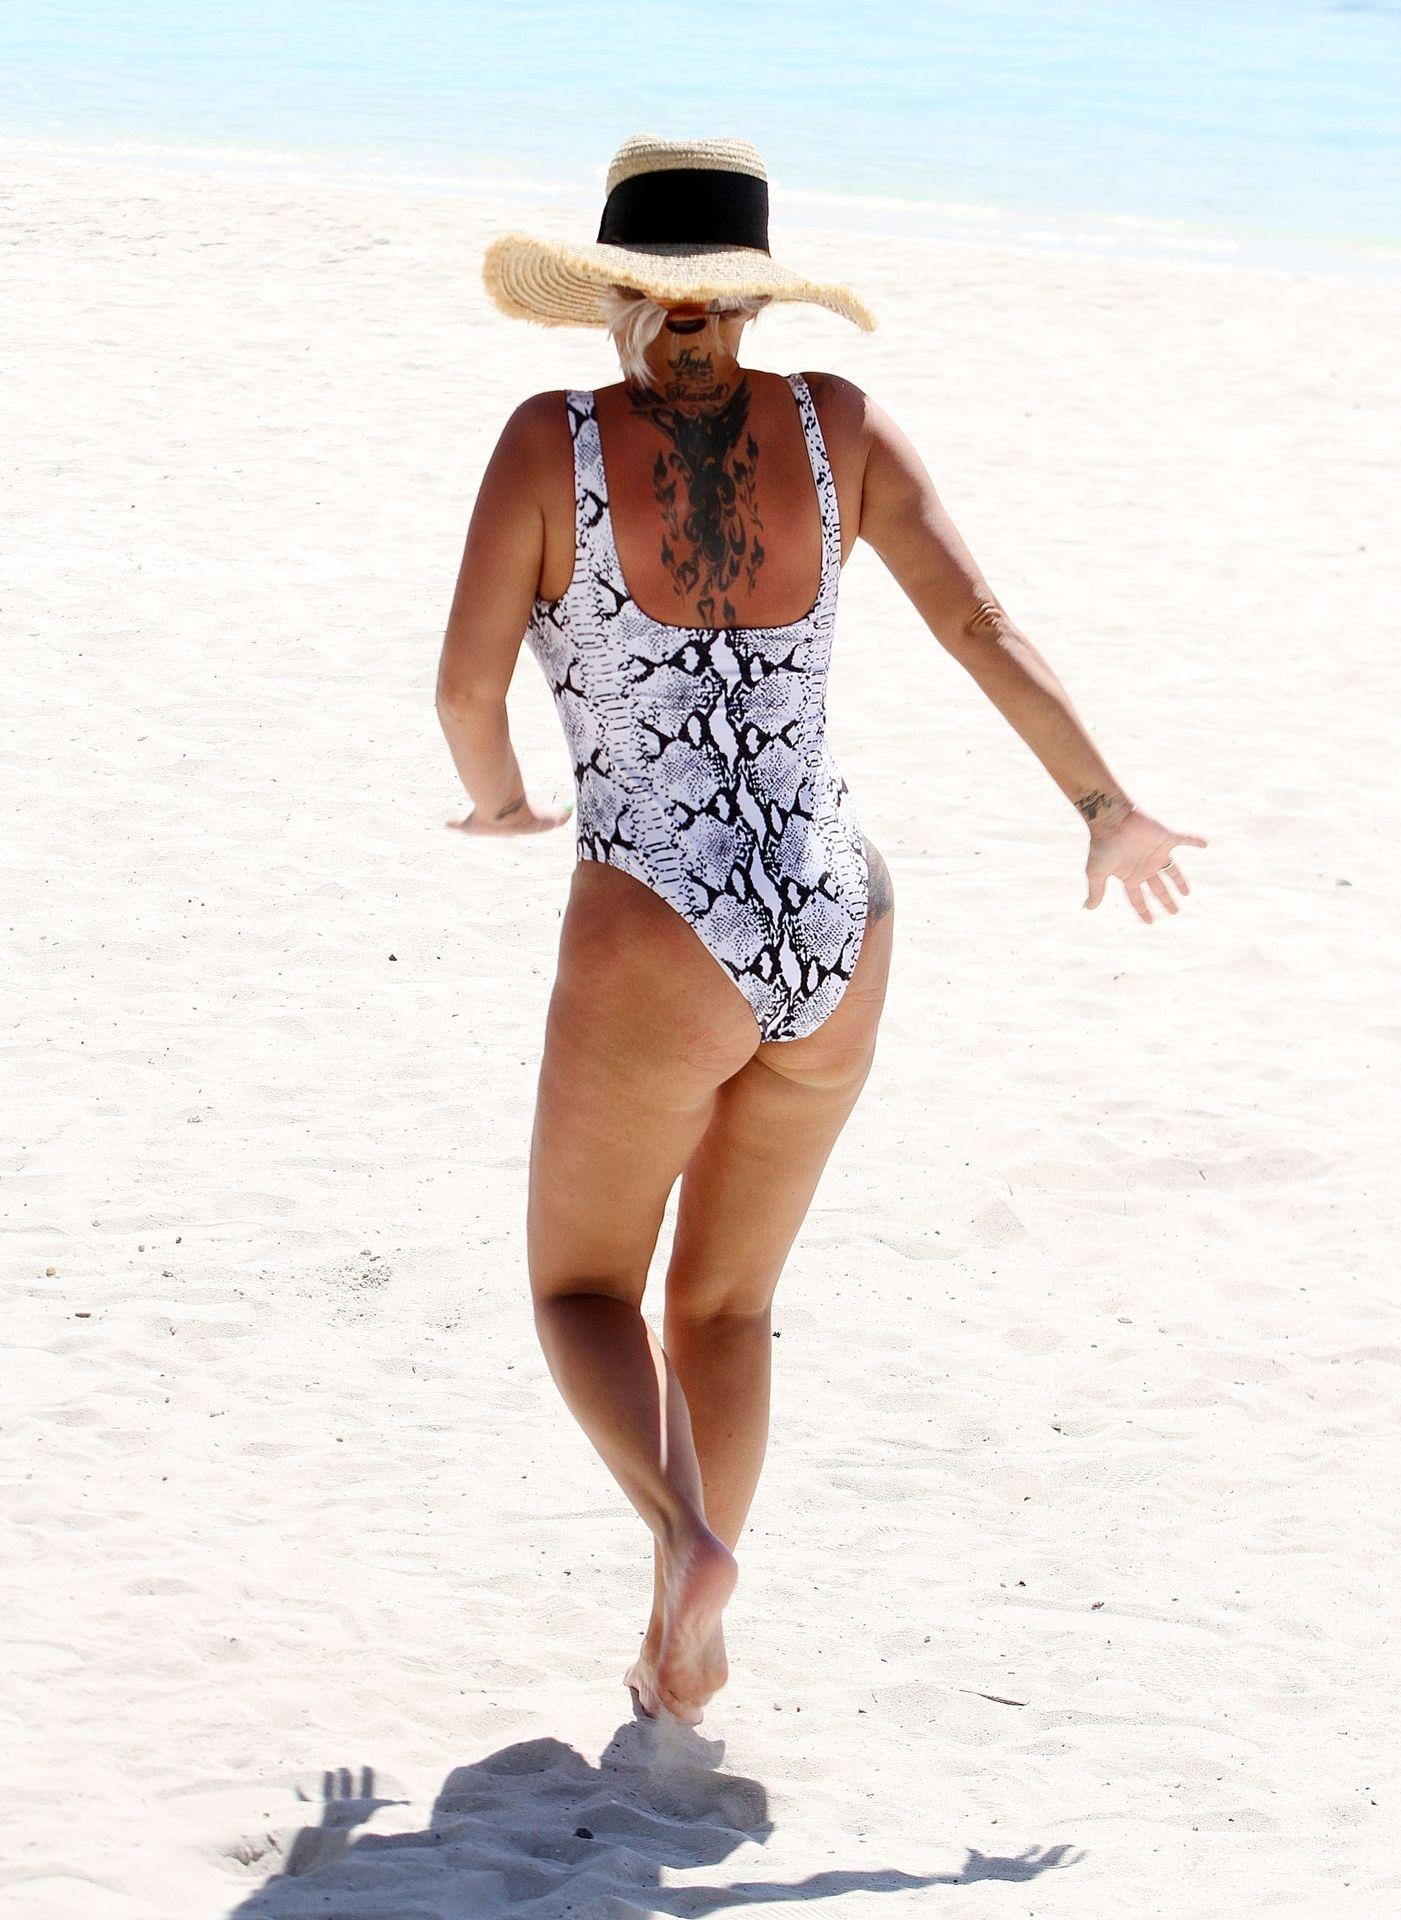 Kerry Katona & Ryan Mahoney Hit The Beach On Holiday At Their Luxury 5 Star Resort Ayada Maldives 0035